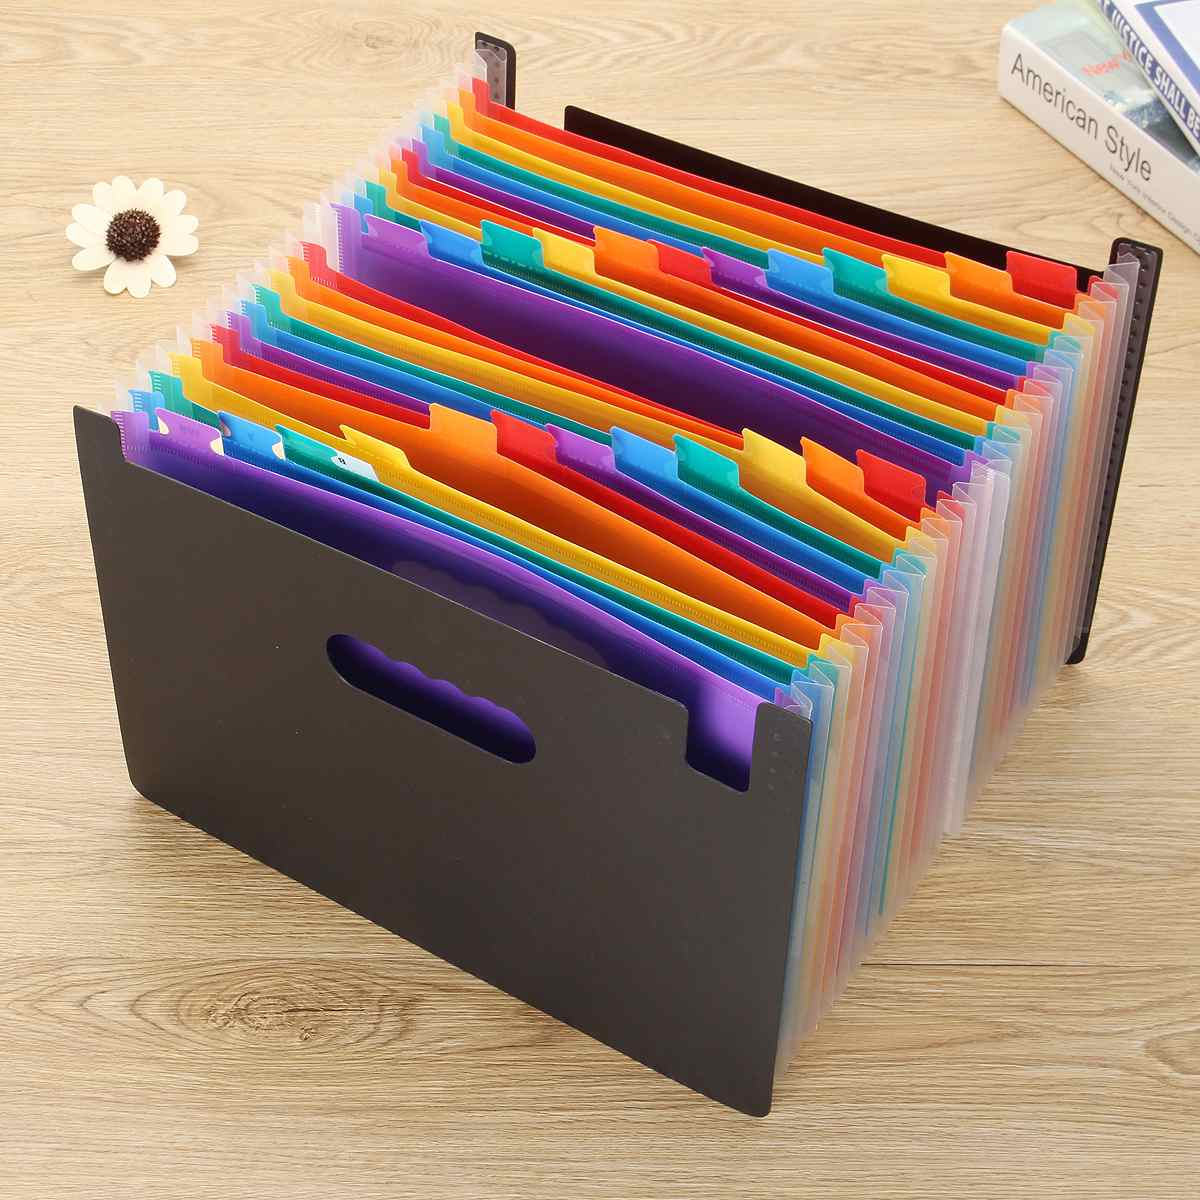 Expanding File Folder A4 Organizer Portable Rainbow Organ Business File Document Holder Storage Bag 24 Pockets